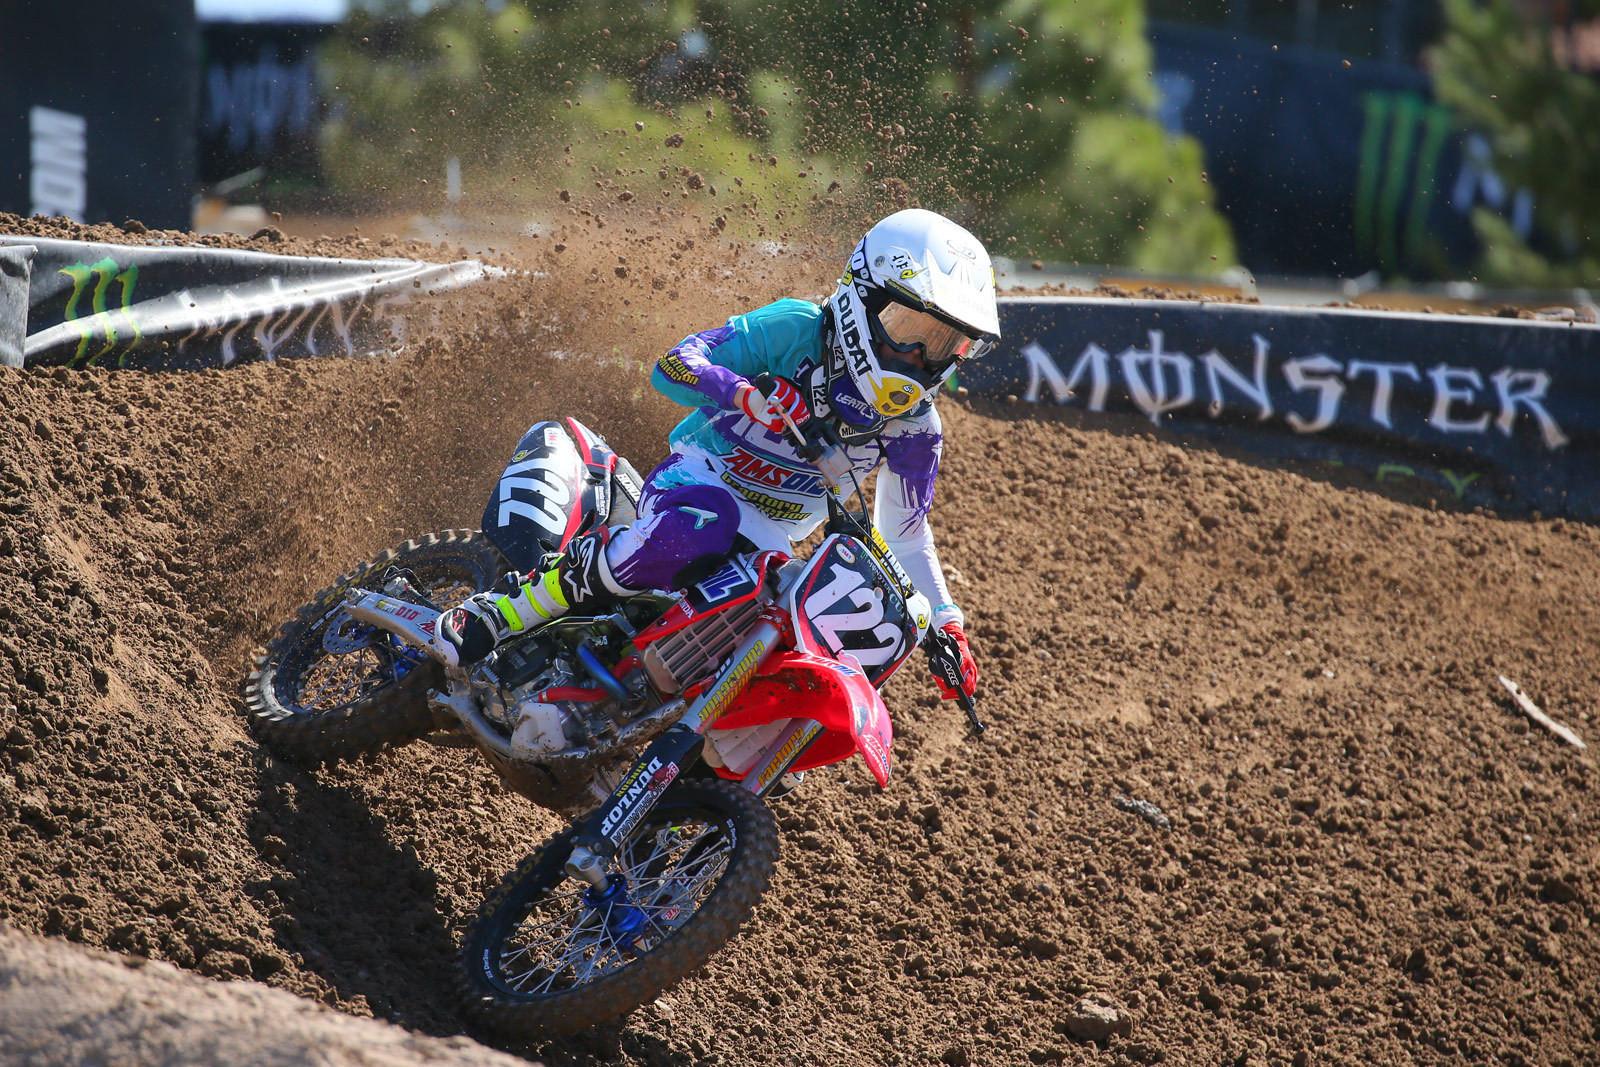 Carson Mumford - Vital MX Pit Bits: 2016 Monster Energy Cup - Motocross Pictures - Vital MX